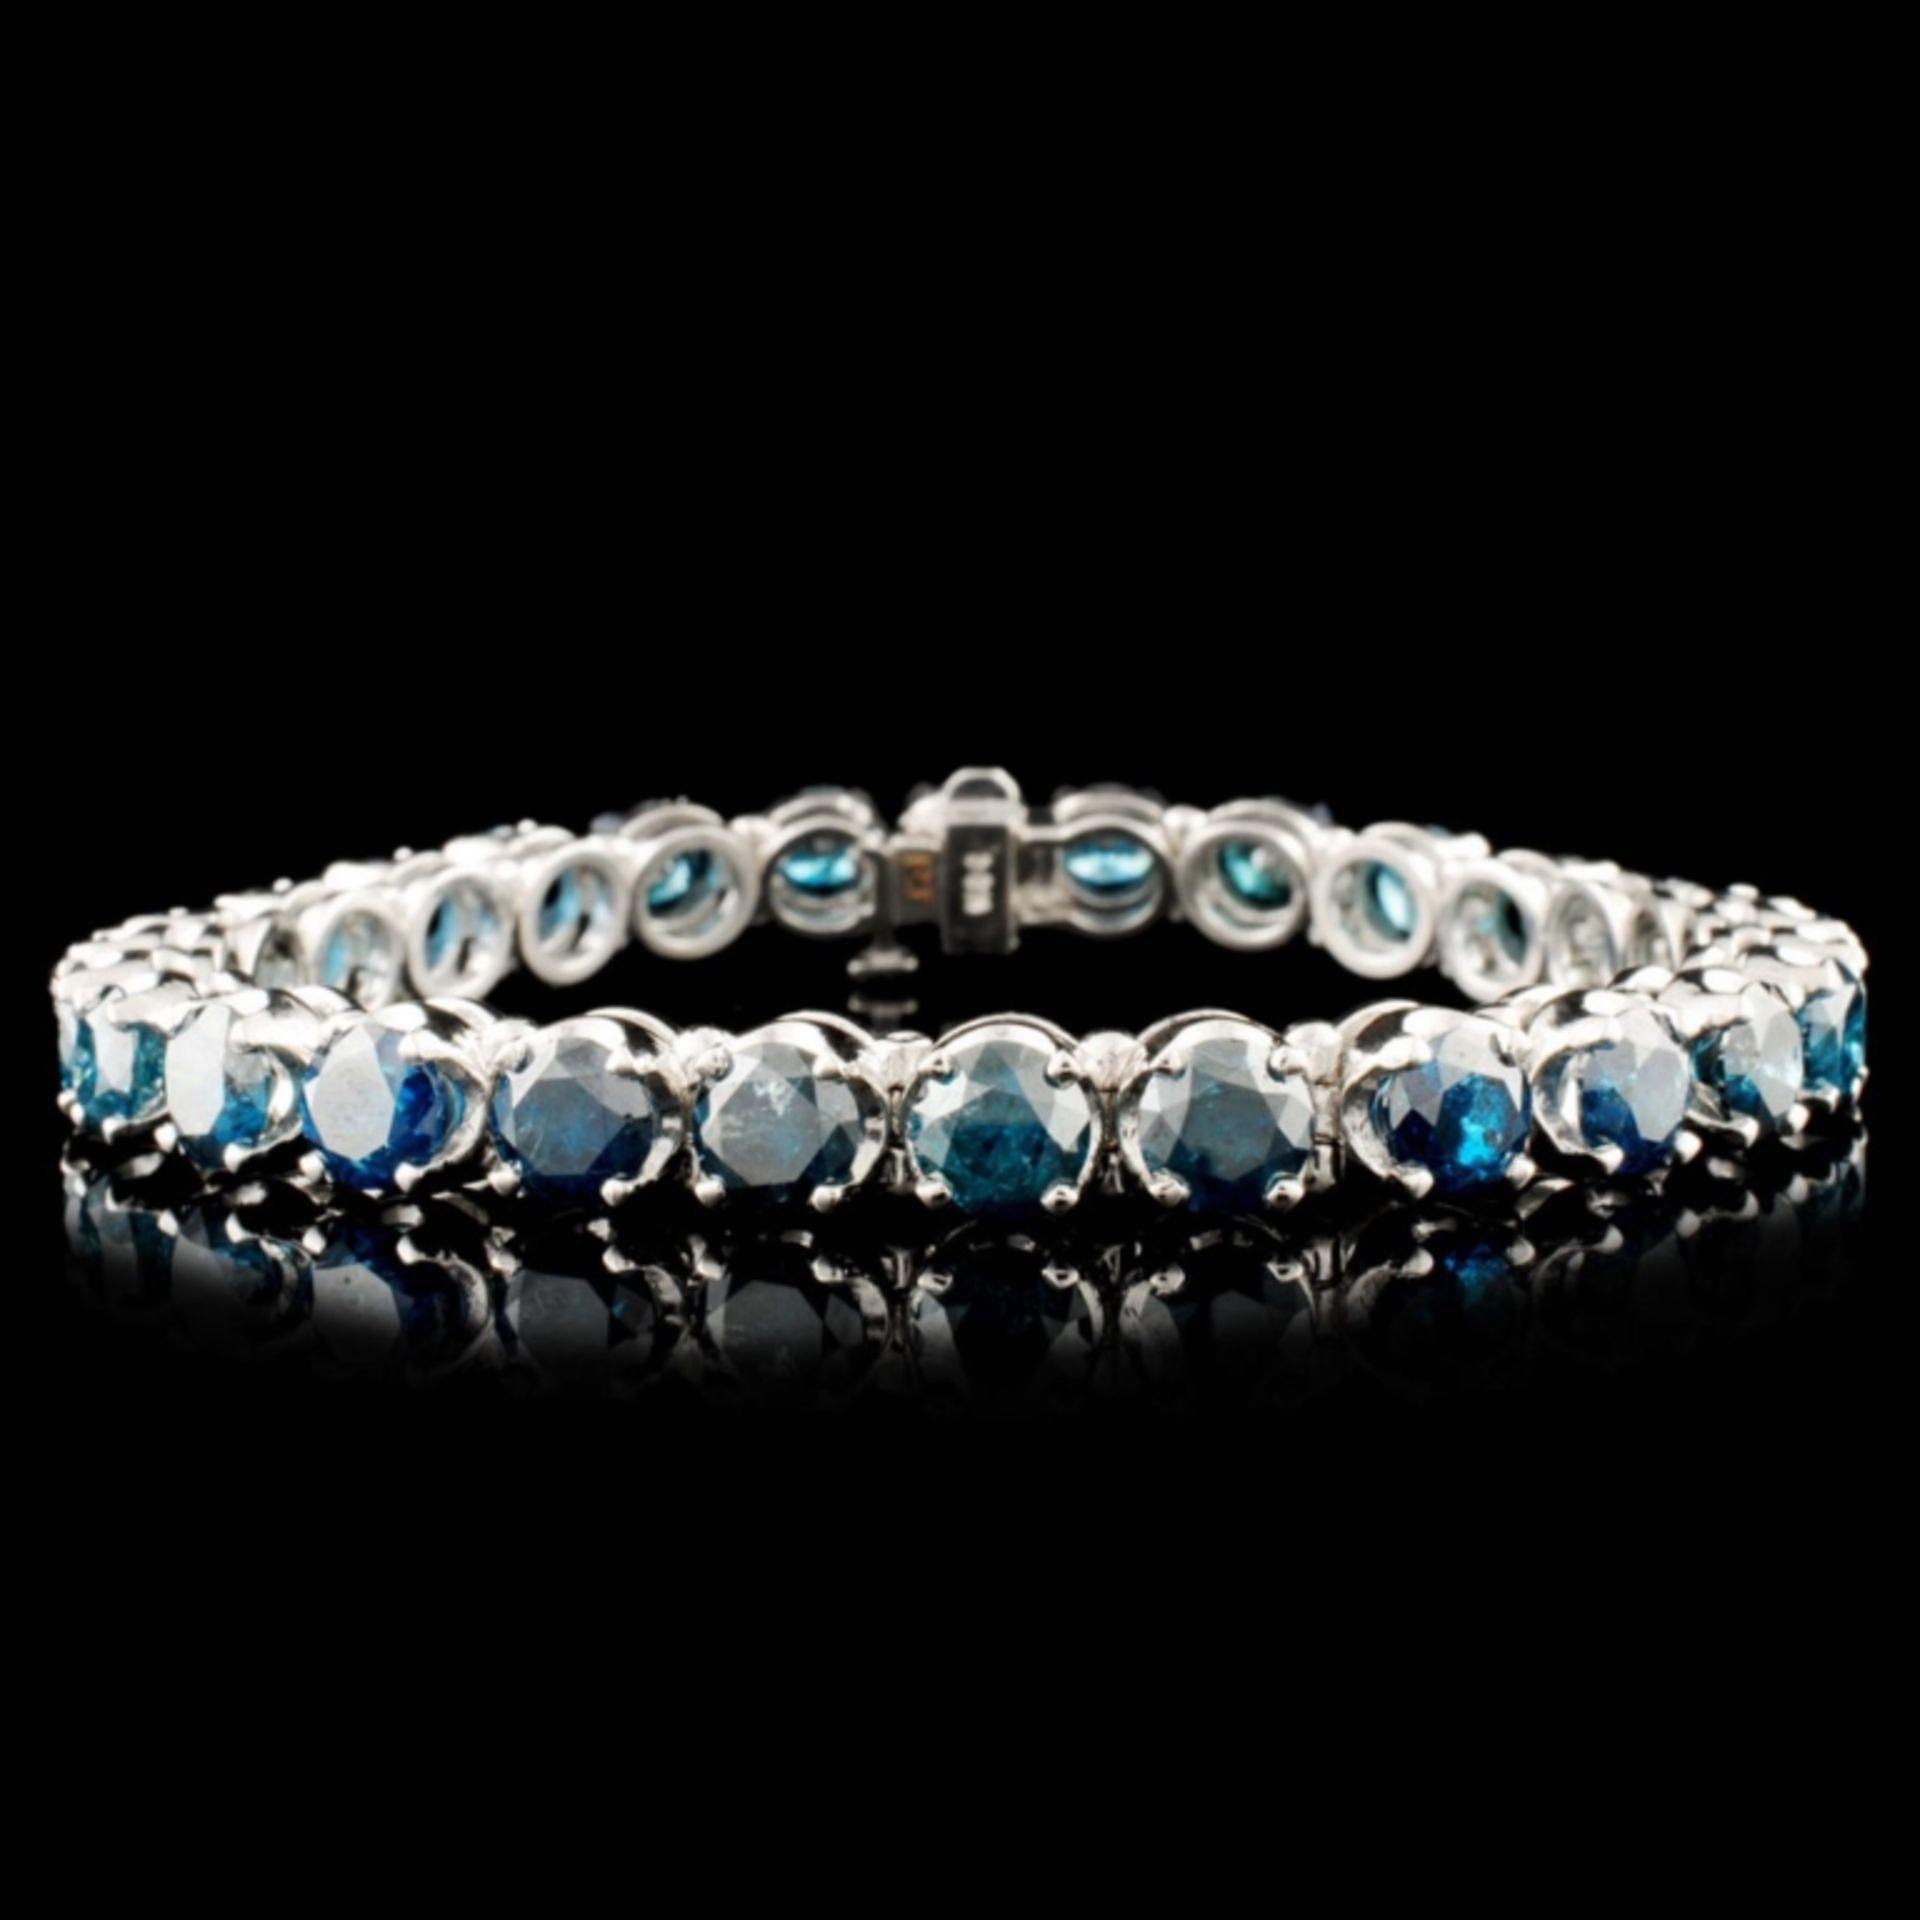 14K Gold 16.98ctw Tennis Diamond Bracelet